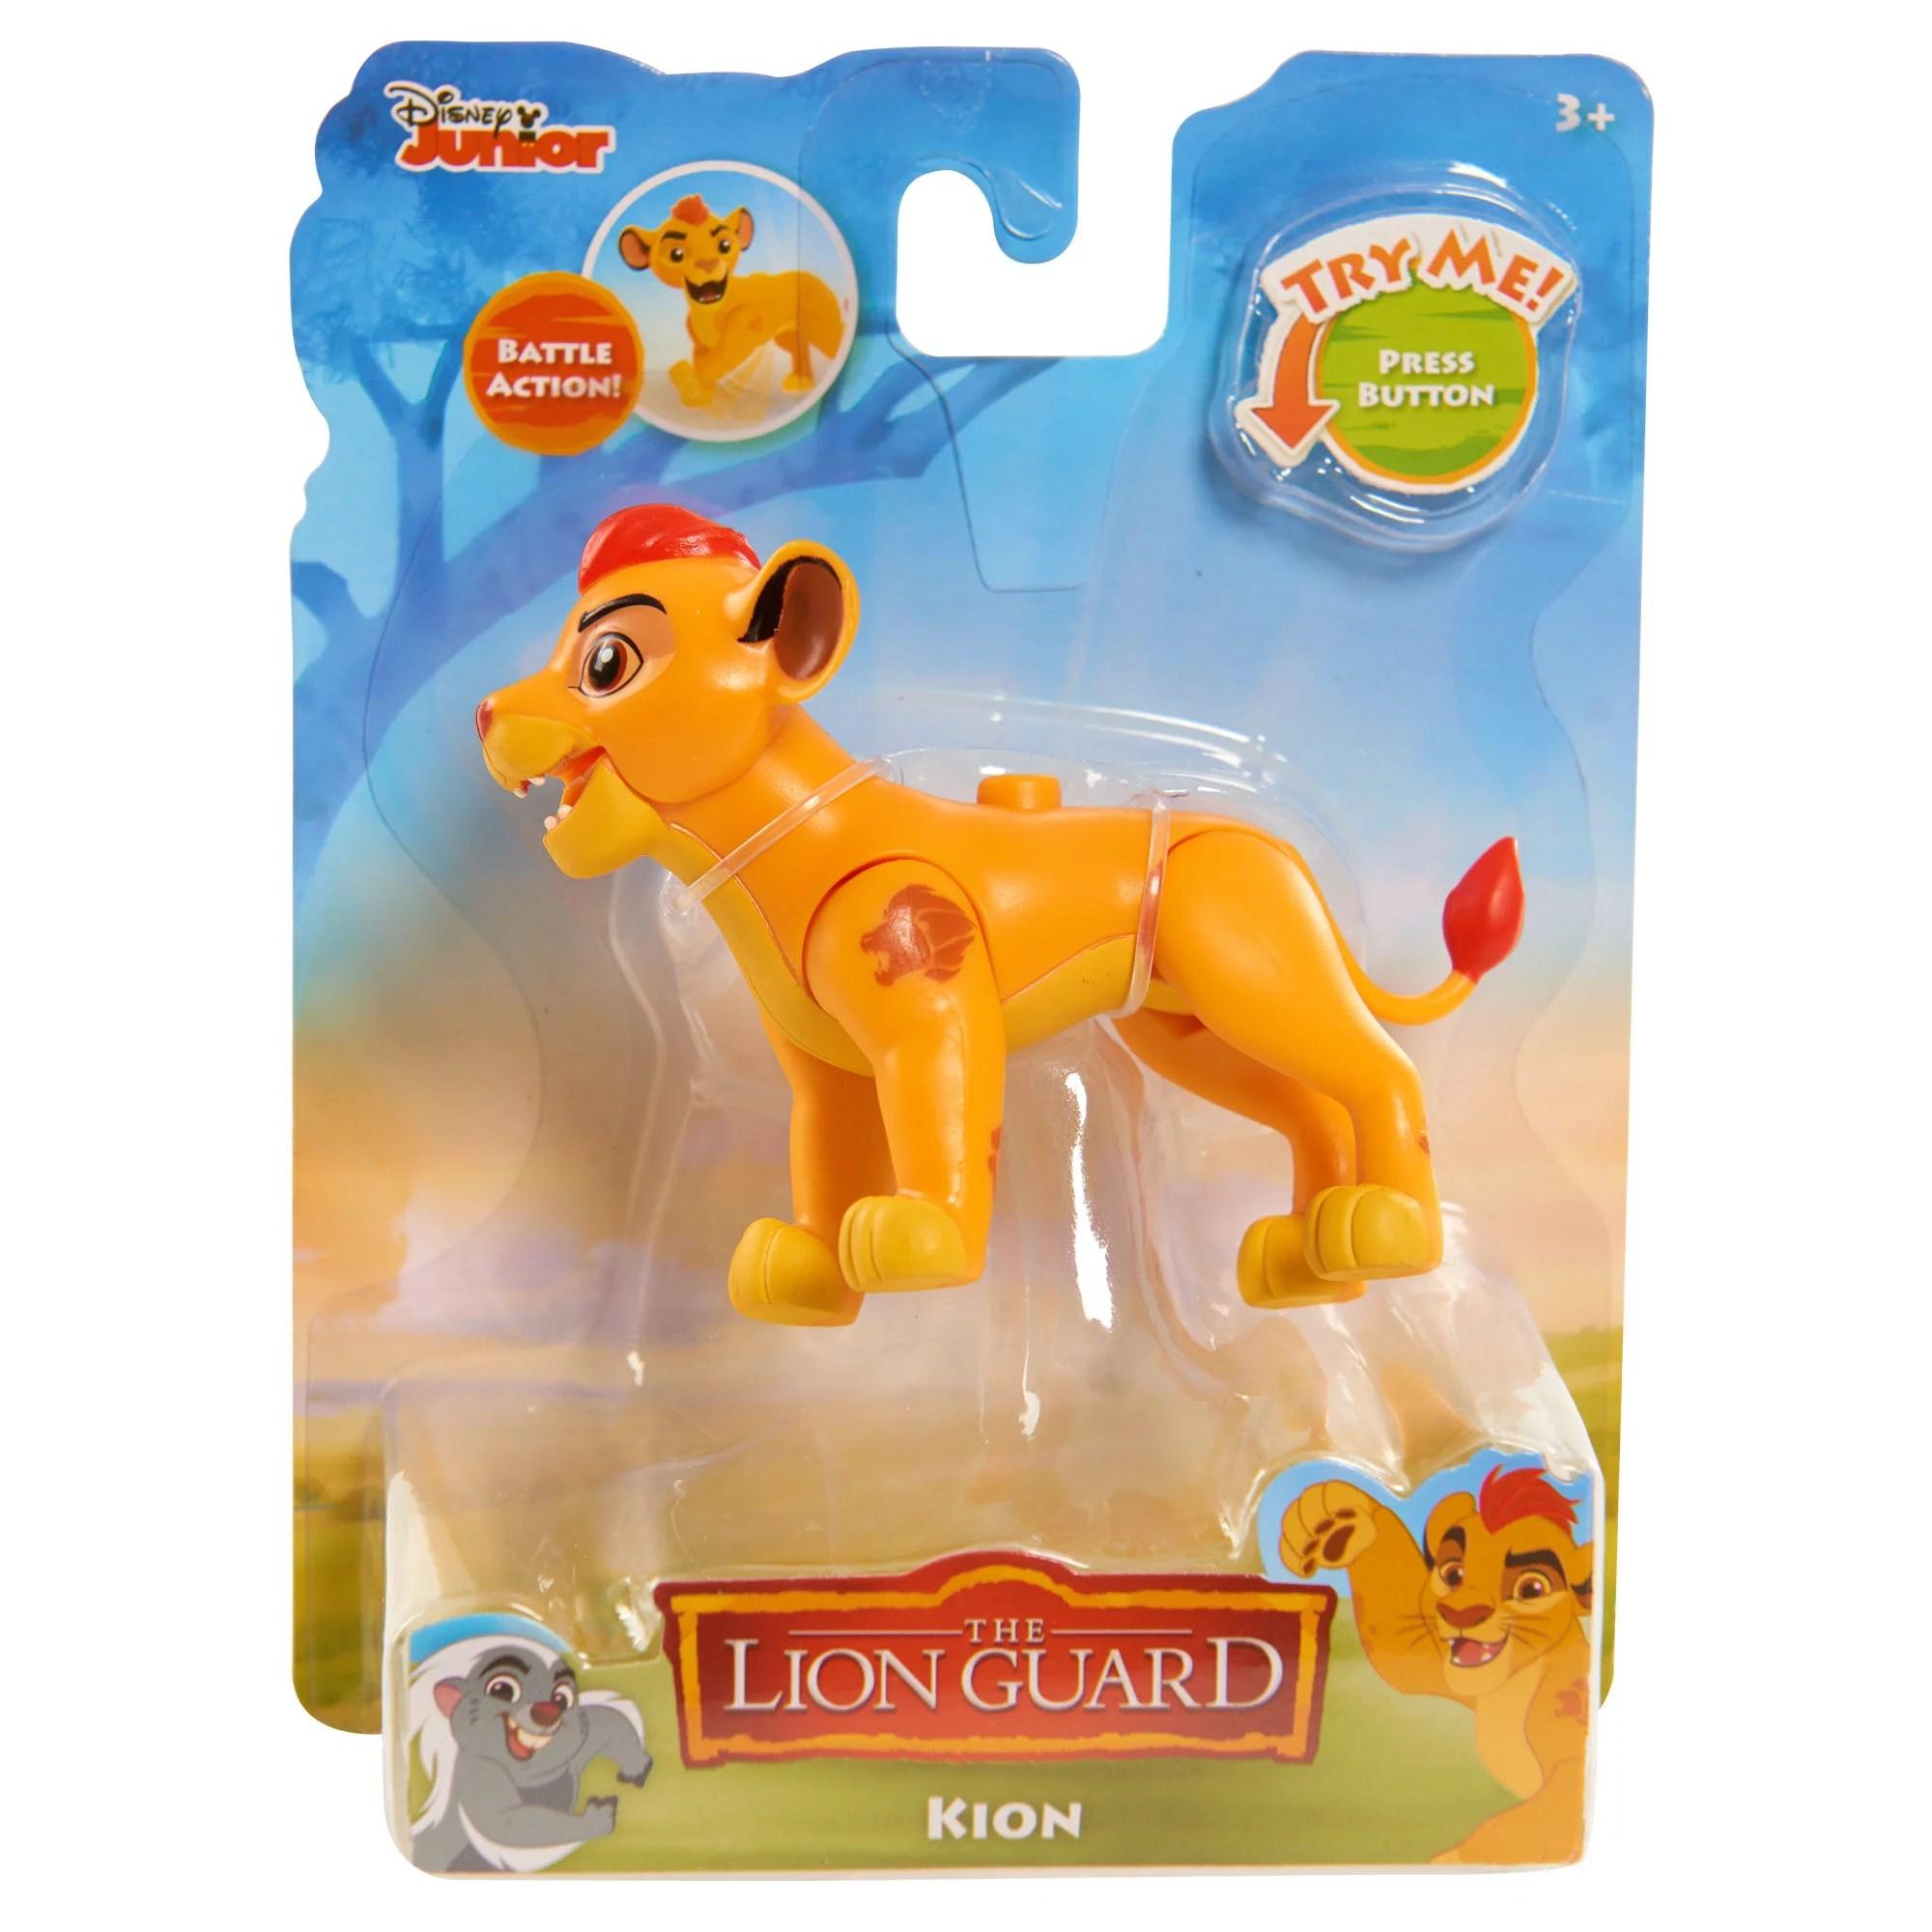 Disney Disney Lion Guard Action Figures Kion Walmart